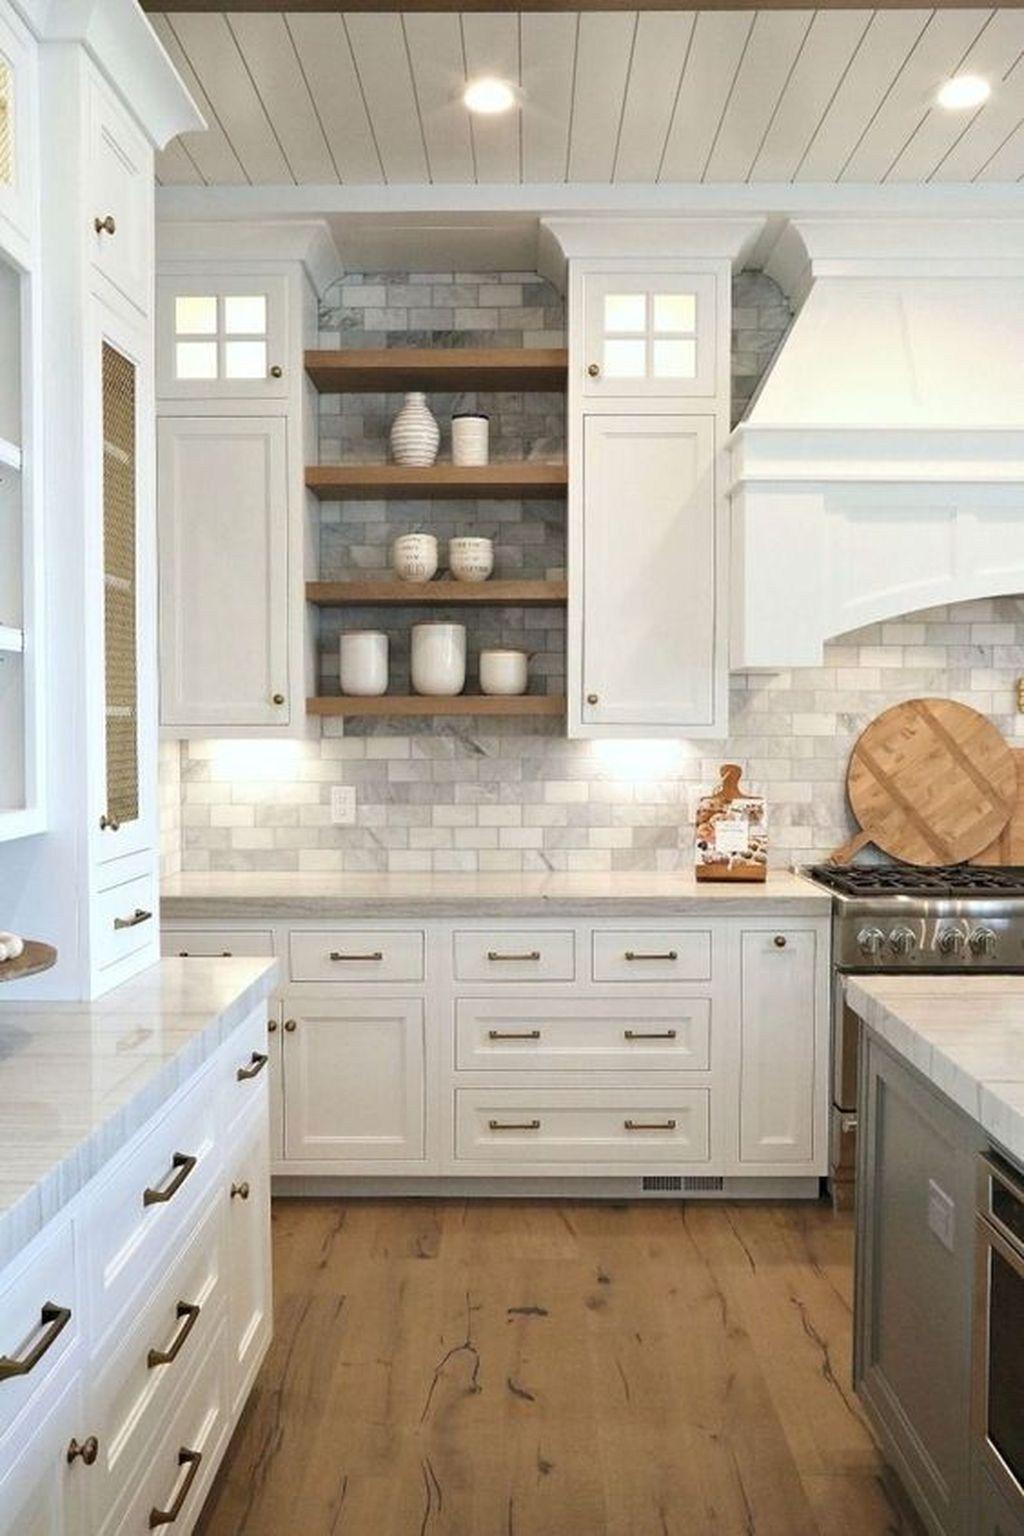 Popular Modern Farmhouse Kitchen Backsplash Ideas 07 Kitchen